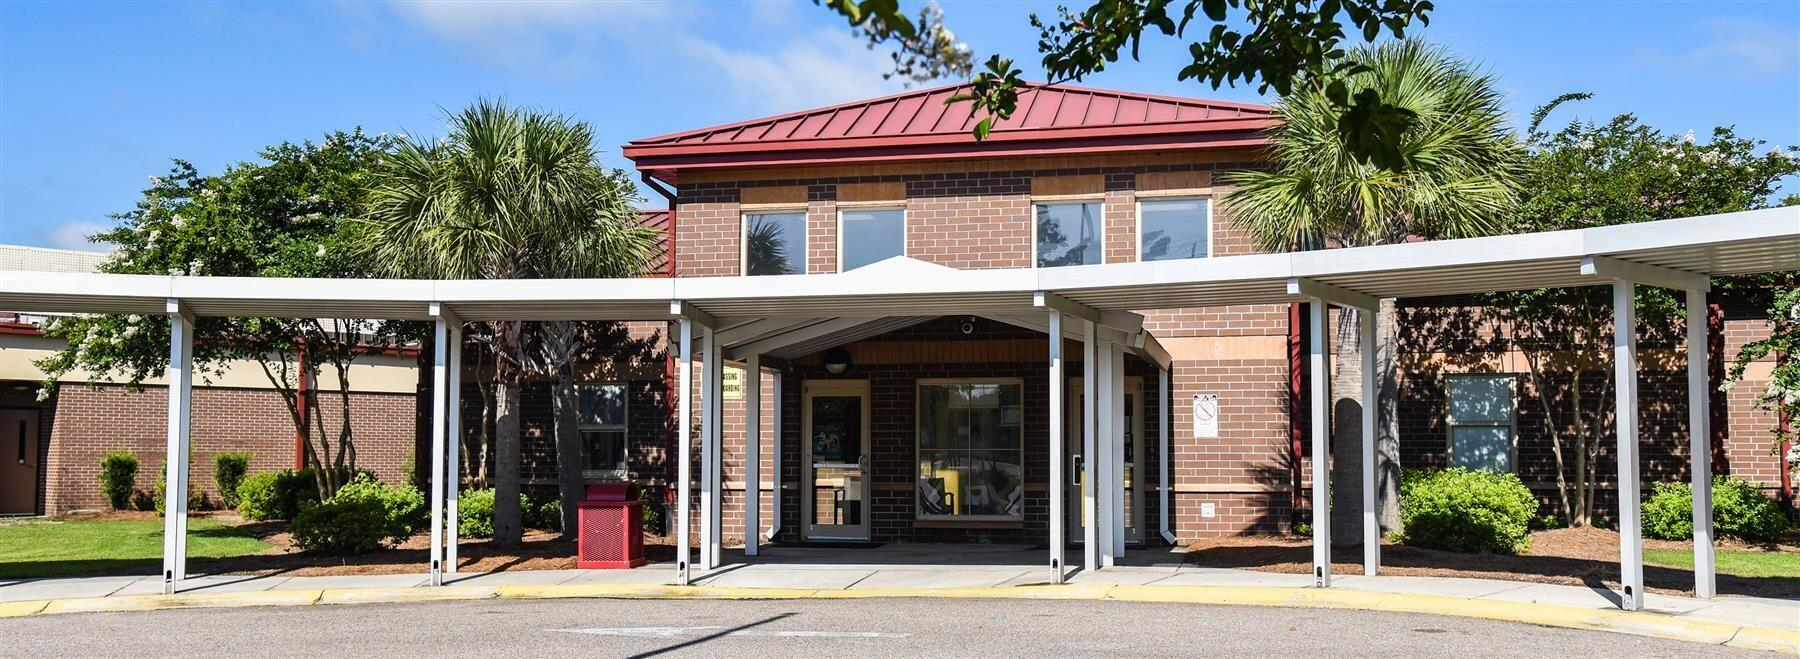 131 Sweet Cherry Lane Summerville, SC 29486